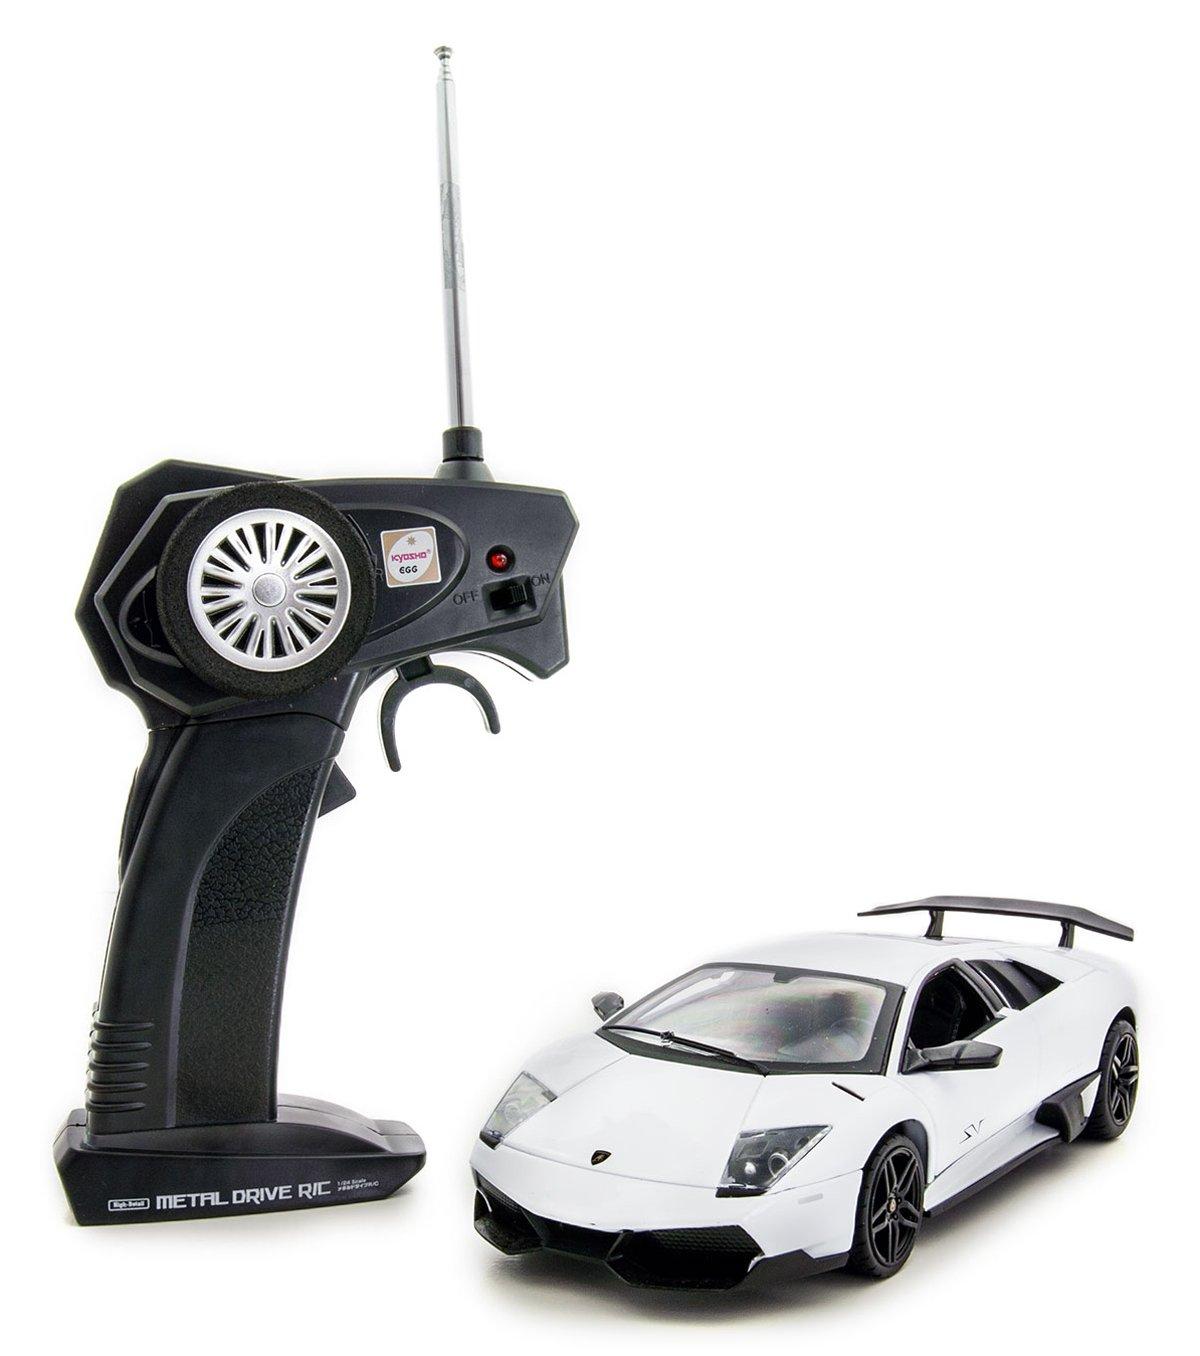 Lamborghini Murcielago RC metal drive (Super bianca) (RC Model) (japan import)